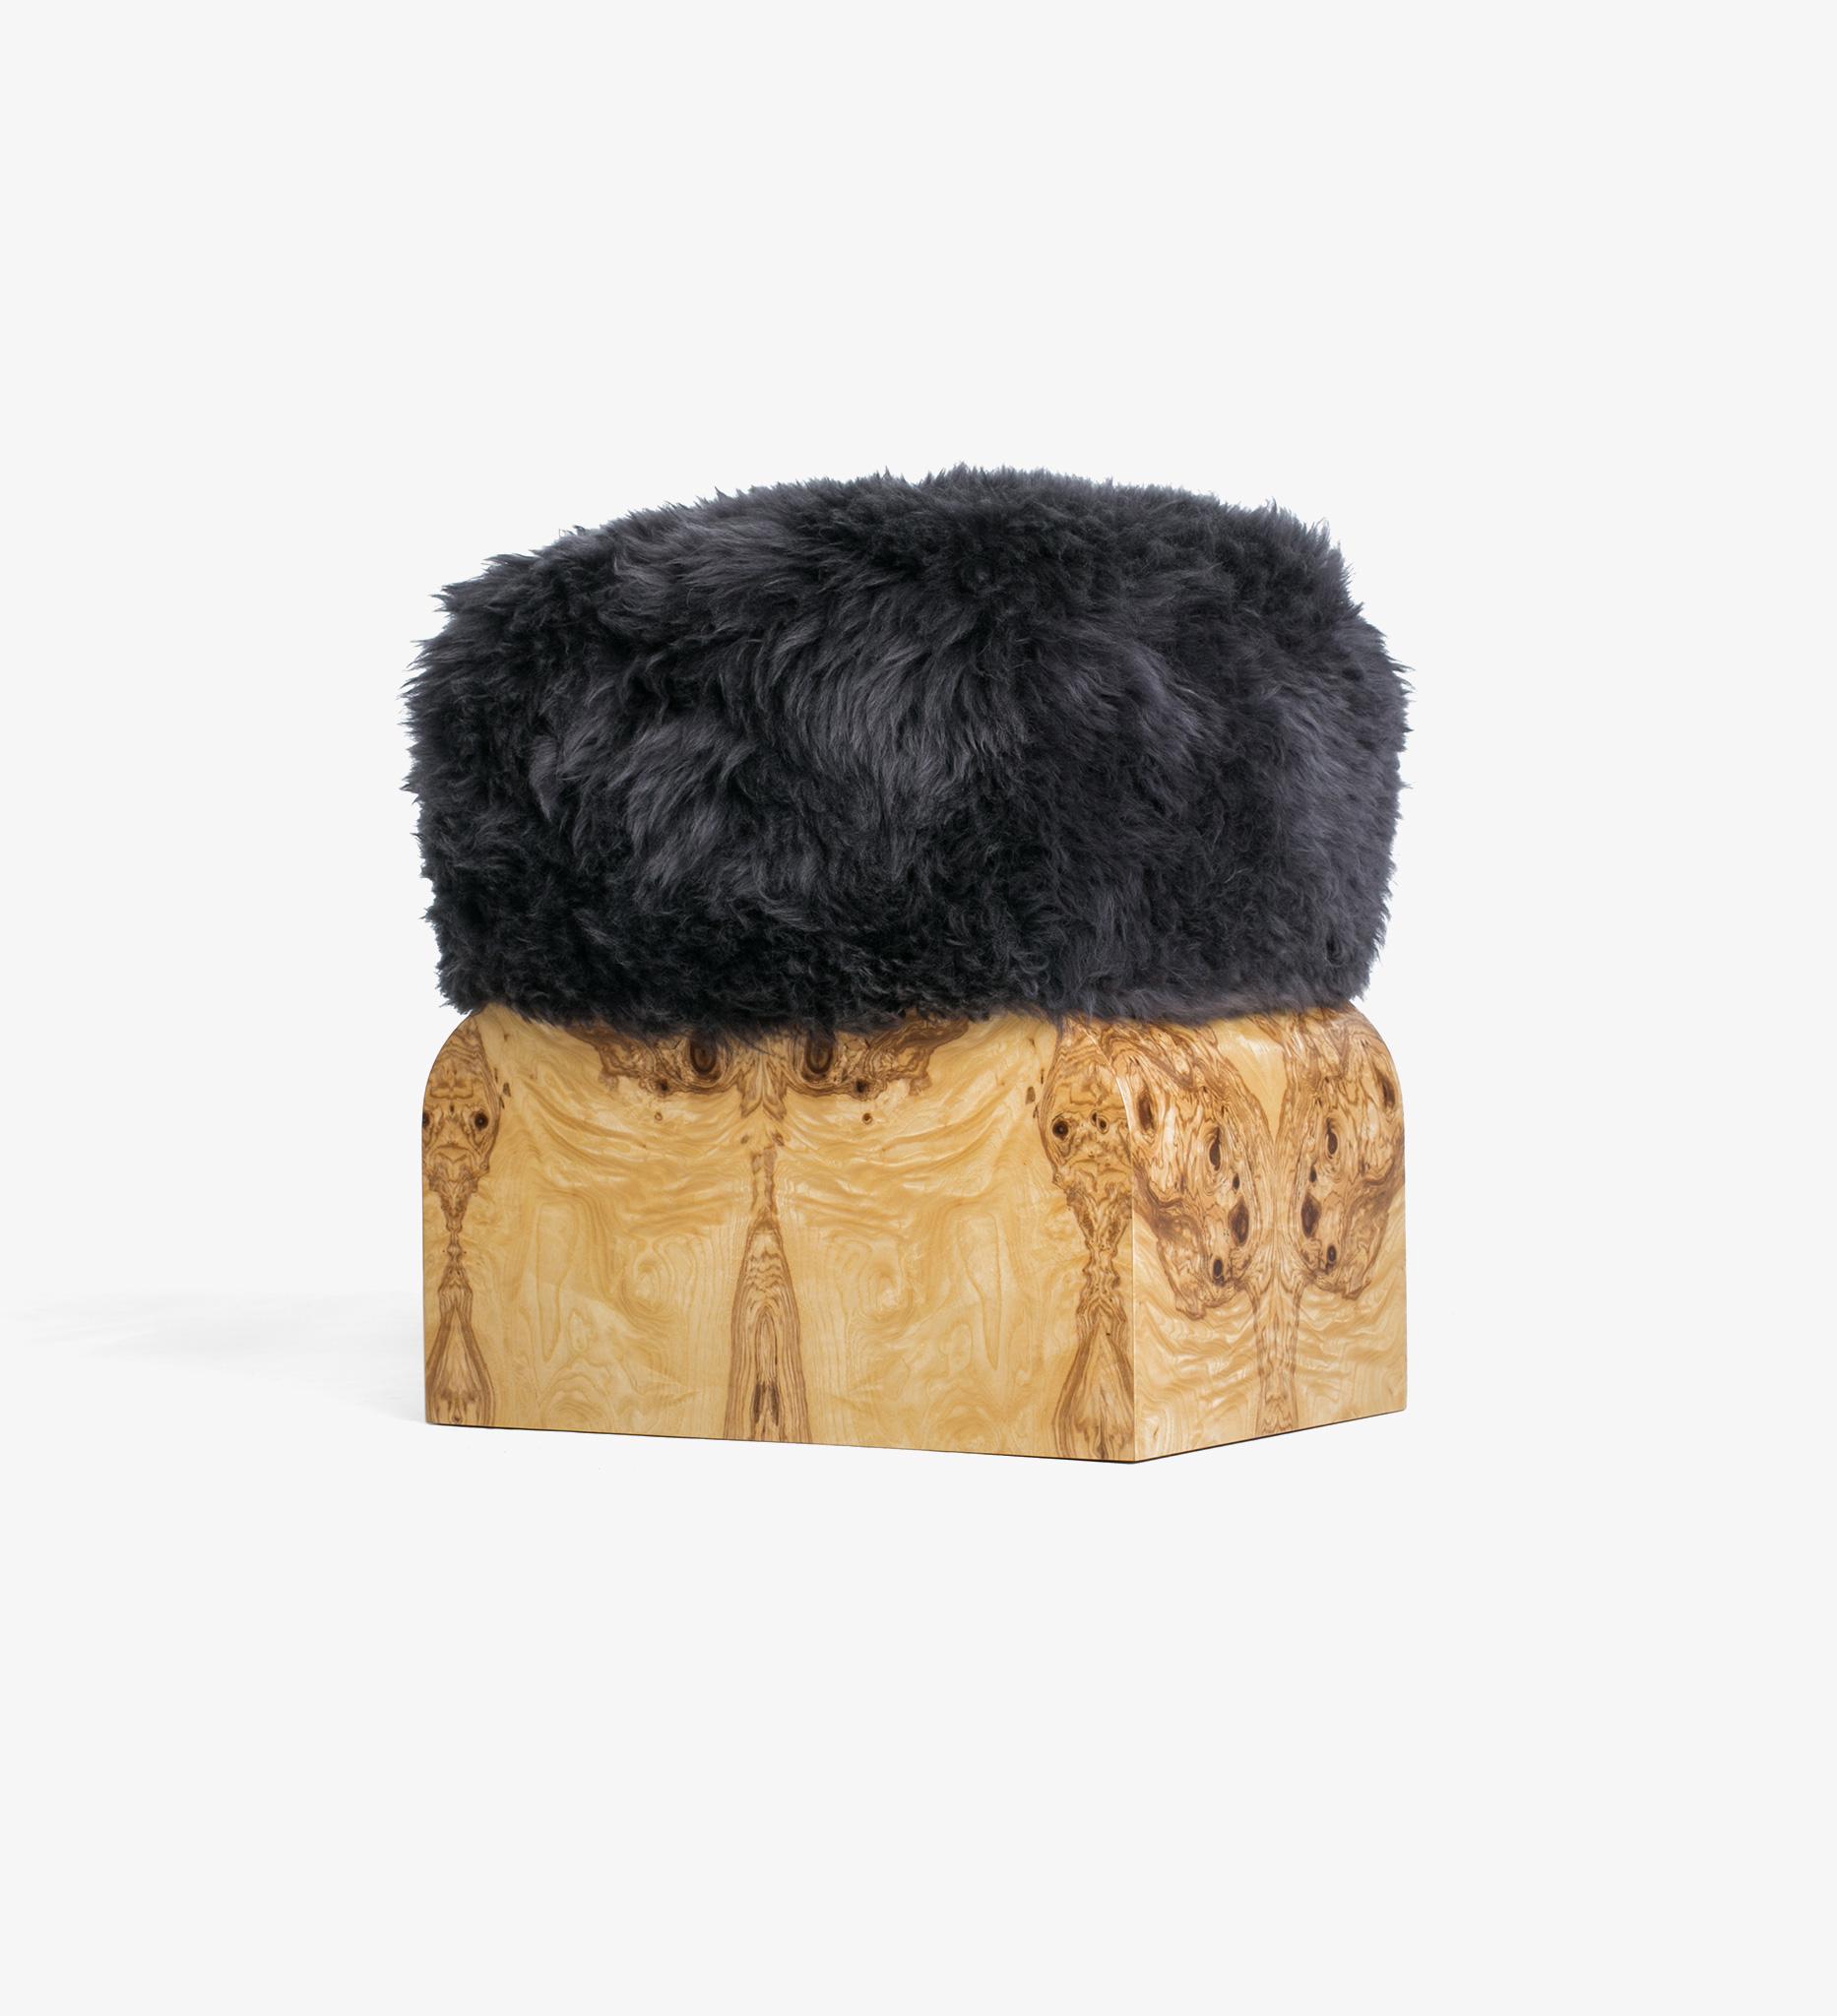 stool, bench, fur, diva, Patagonian Sheepskin,Gunmetal, Olive Ash Burl, Hazel, burl, wood, natural, neutral